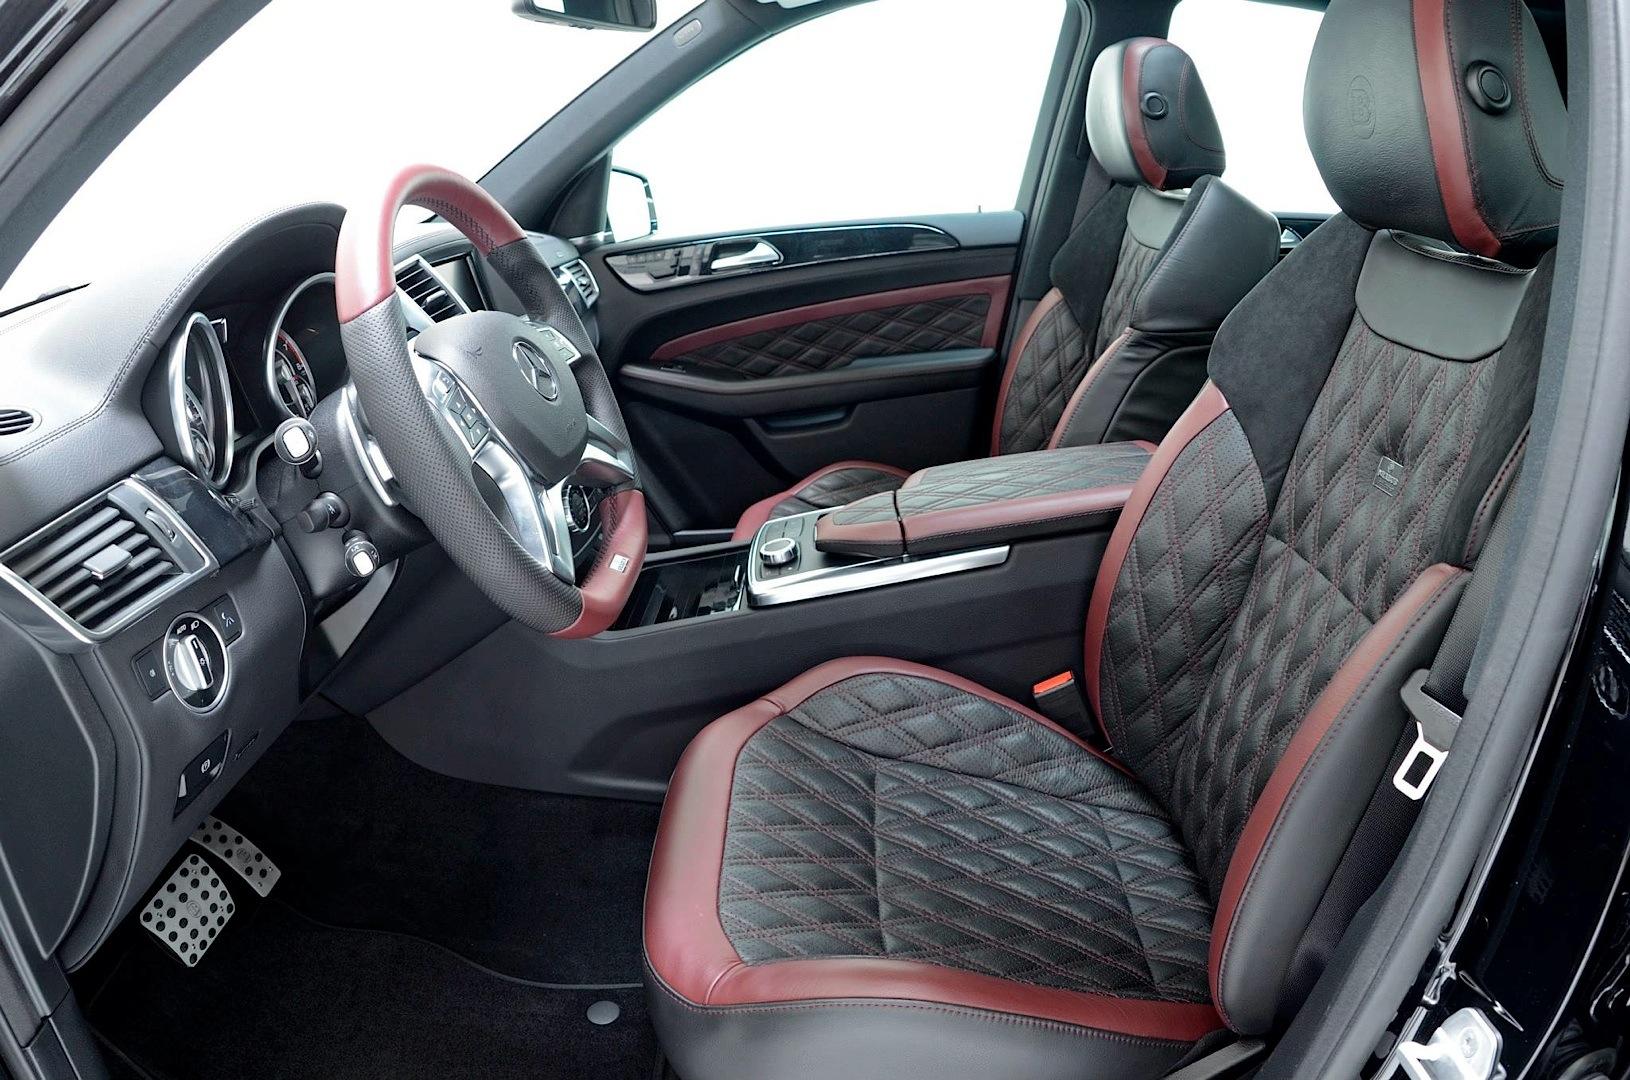 Brabus Unleashes 700 Hp Mercedes Benz ML 63 AMG